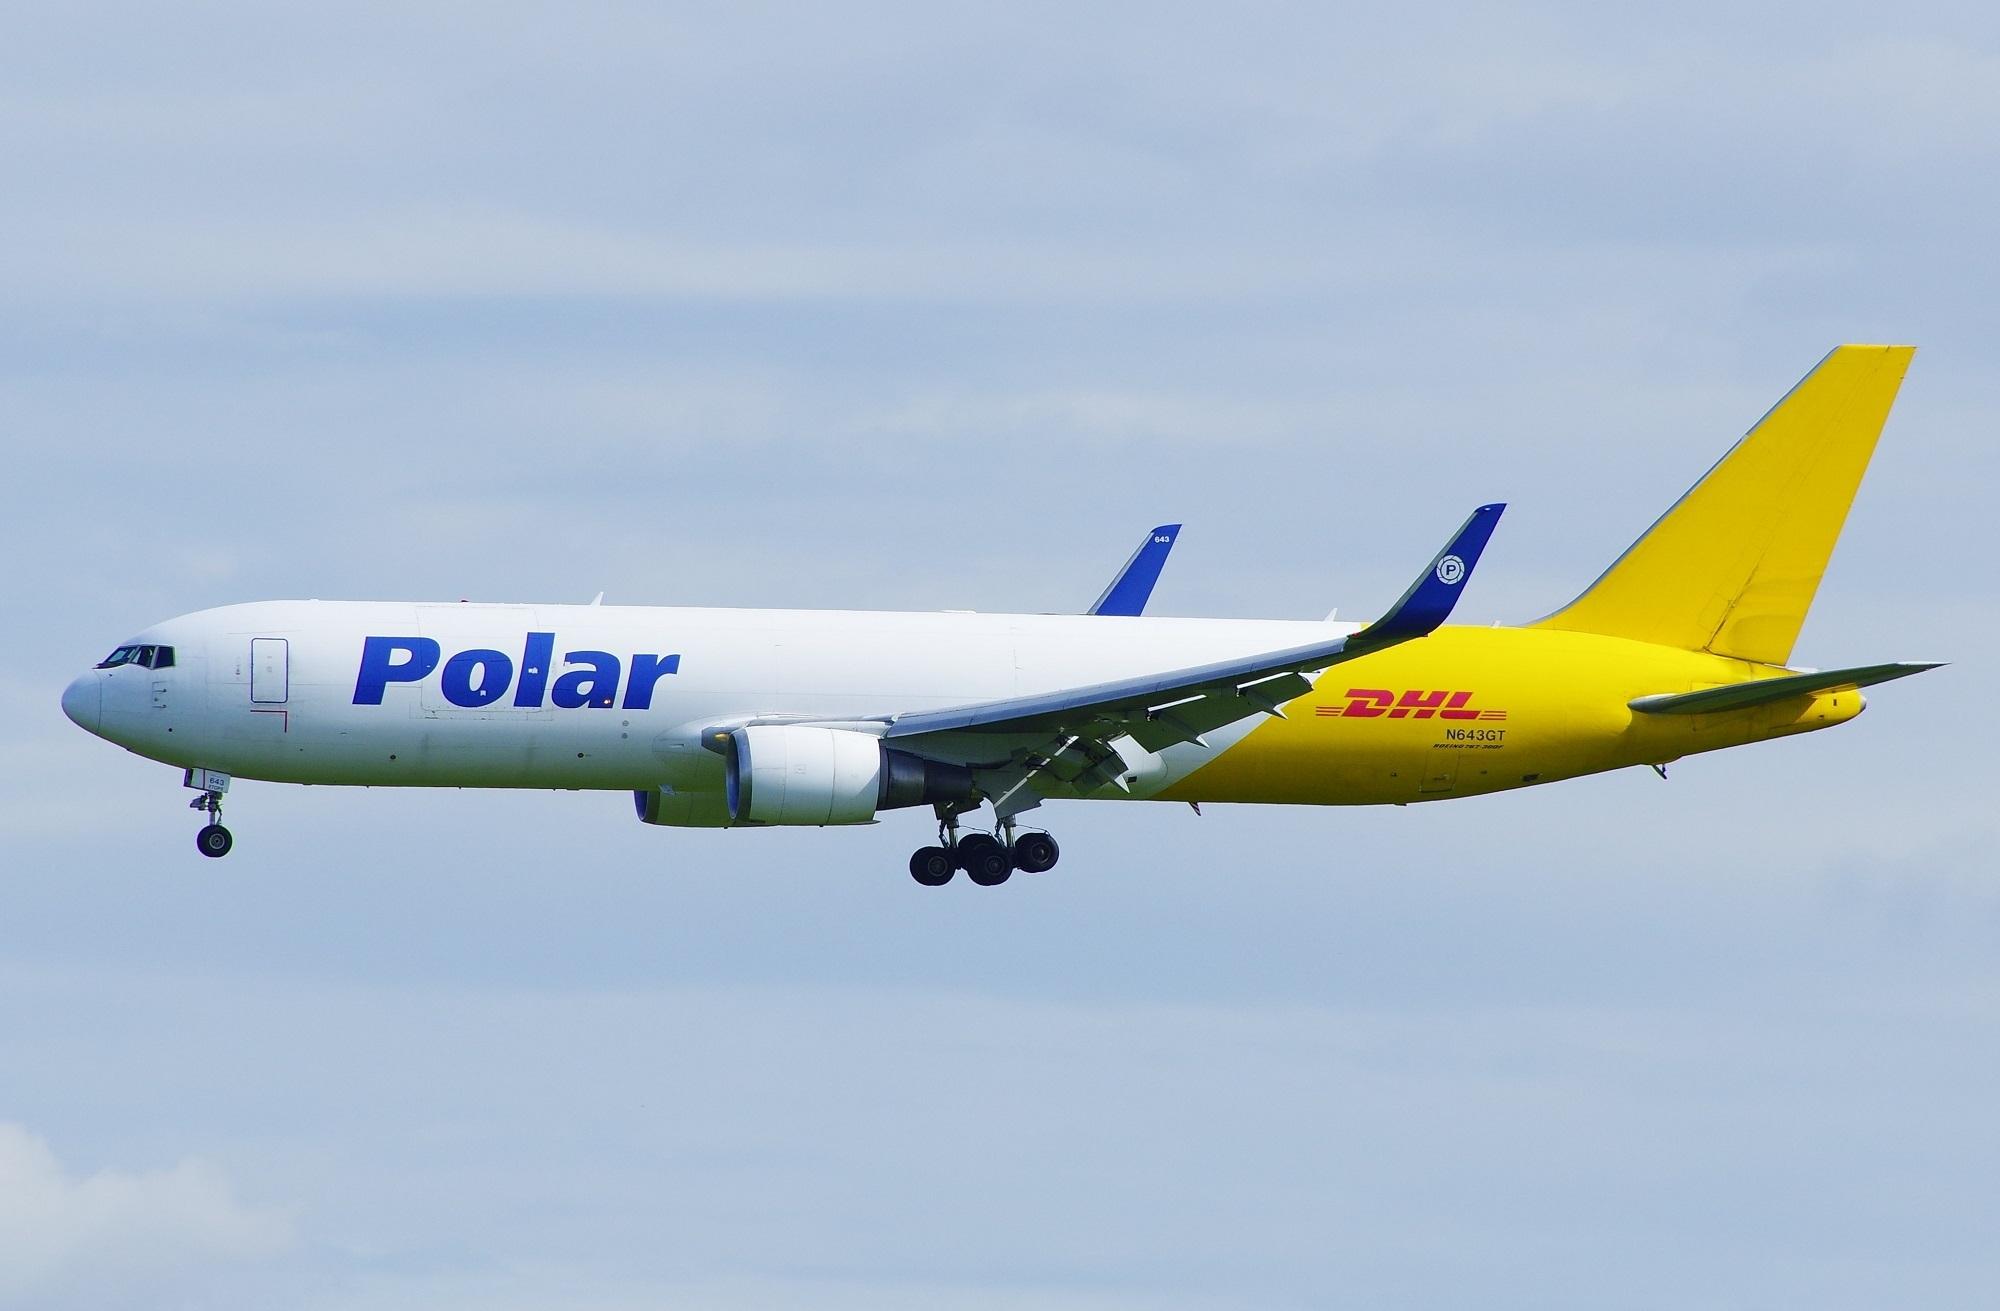 Polar Air Cargo Boeing 767-300F - brummi | ello